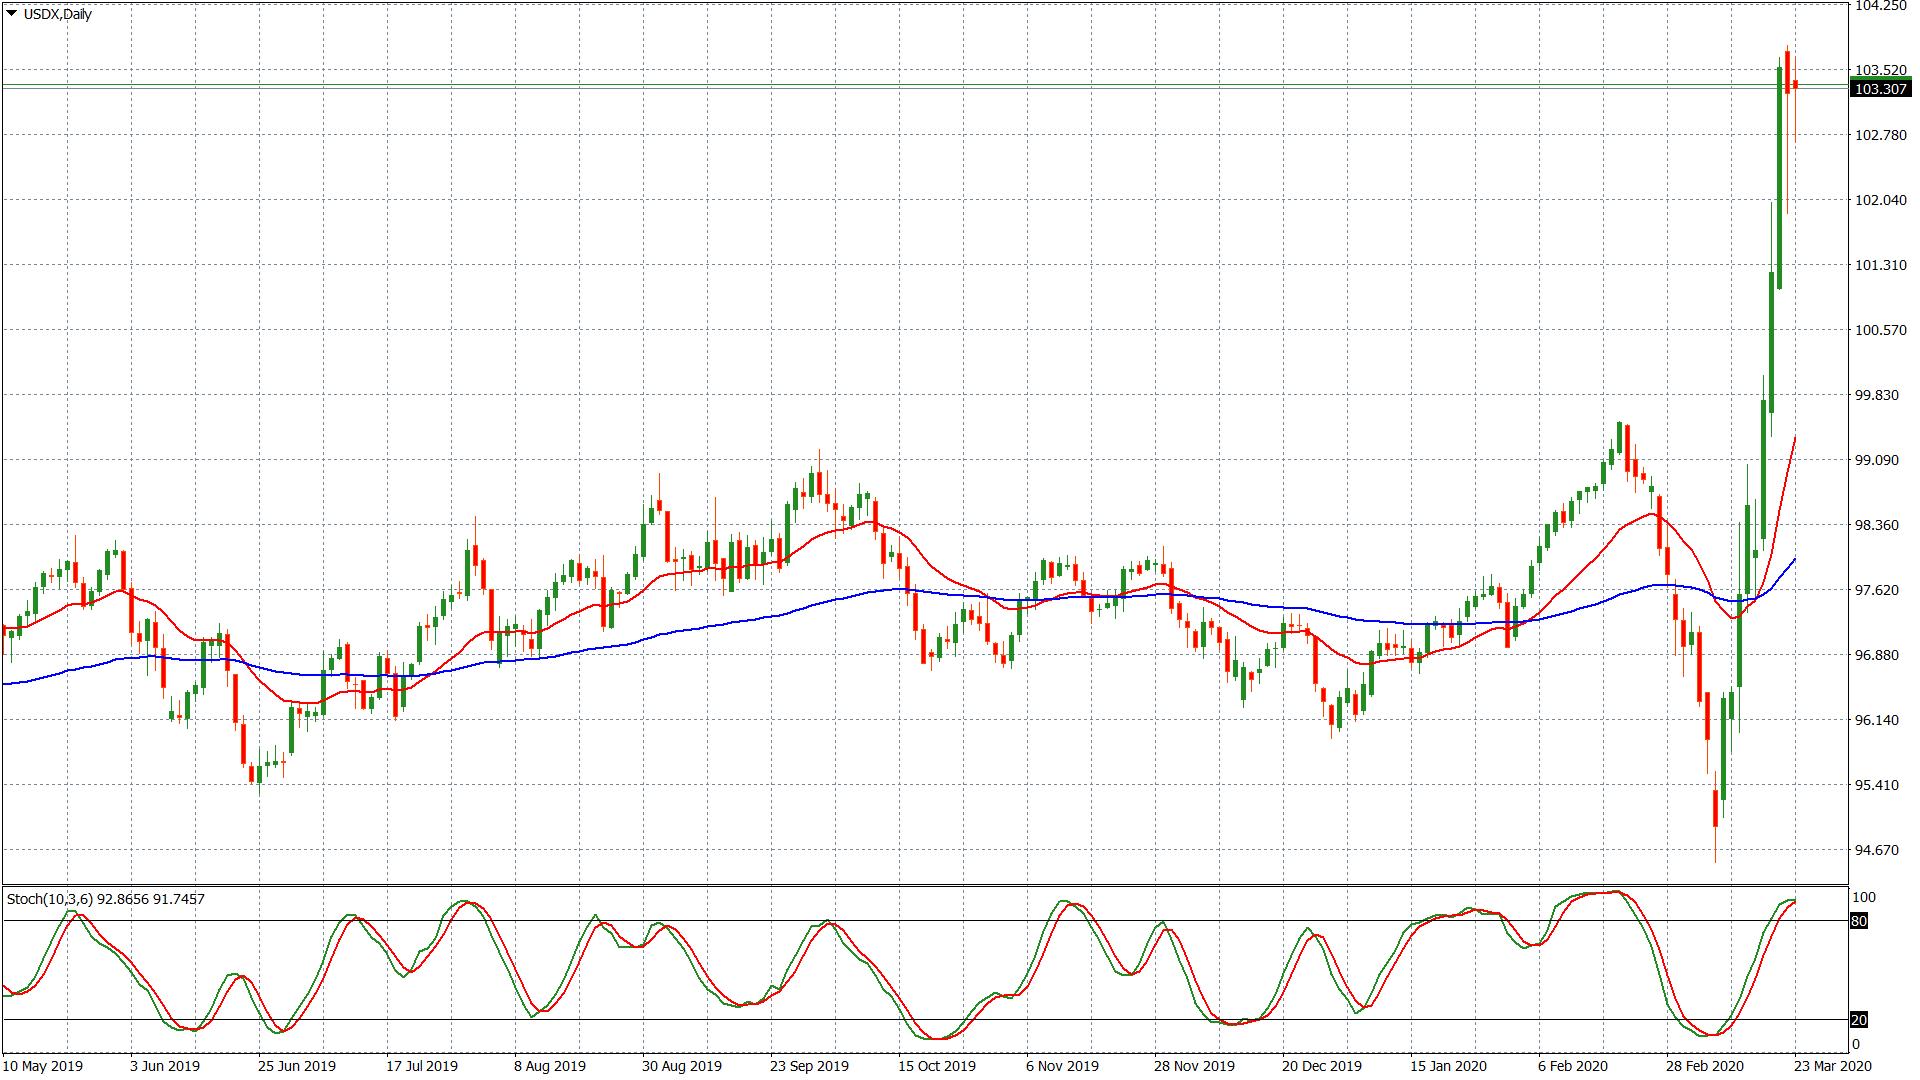 Dollar Index – grafico giornaliero